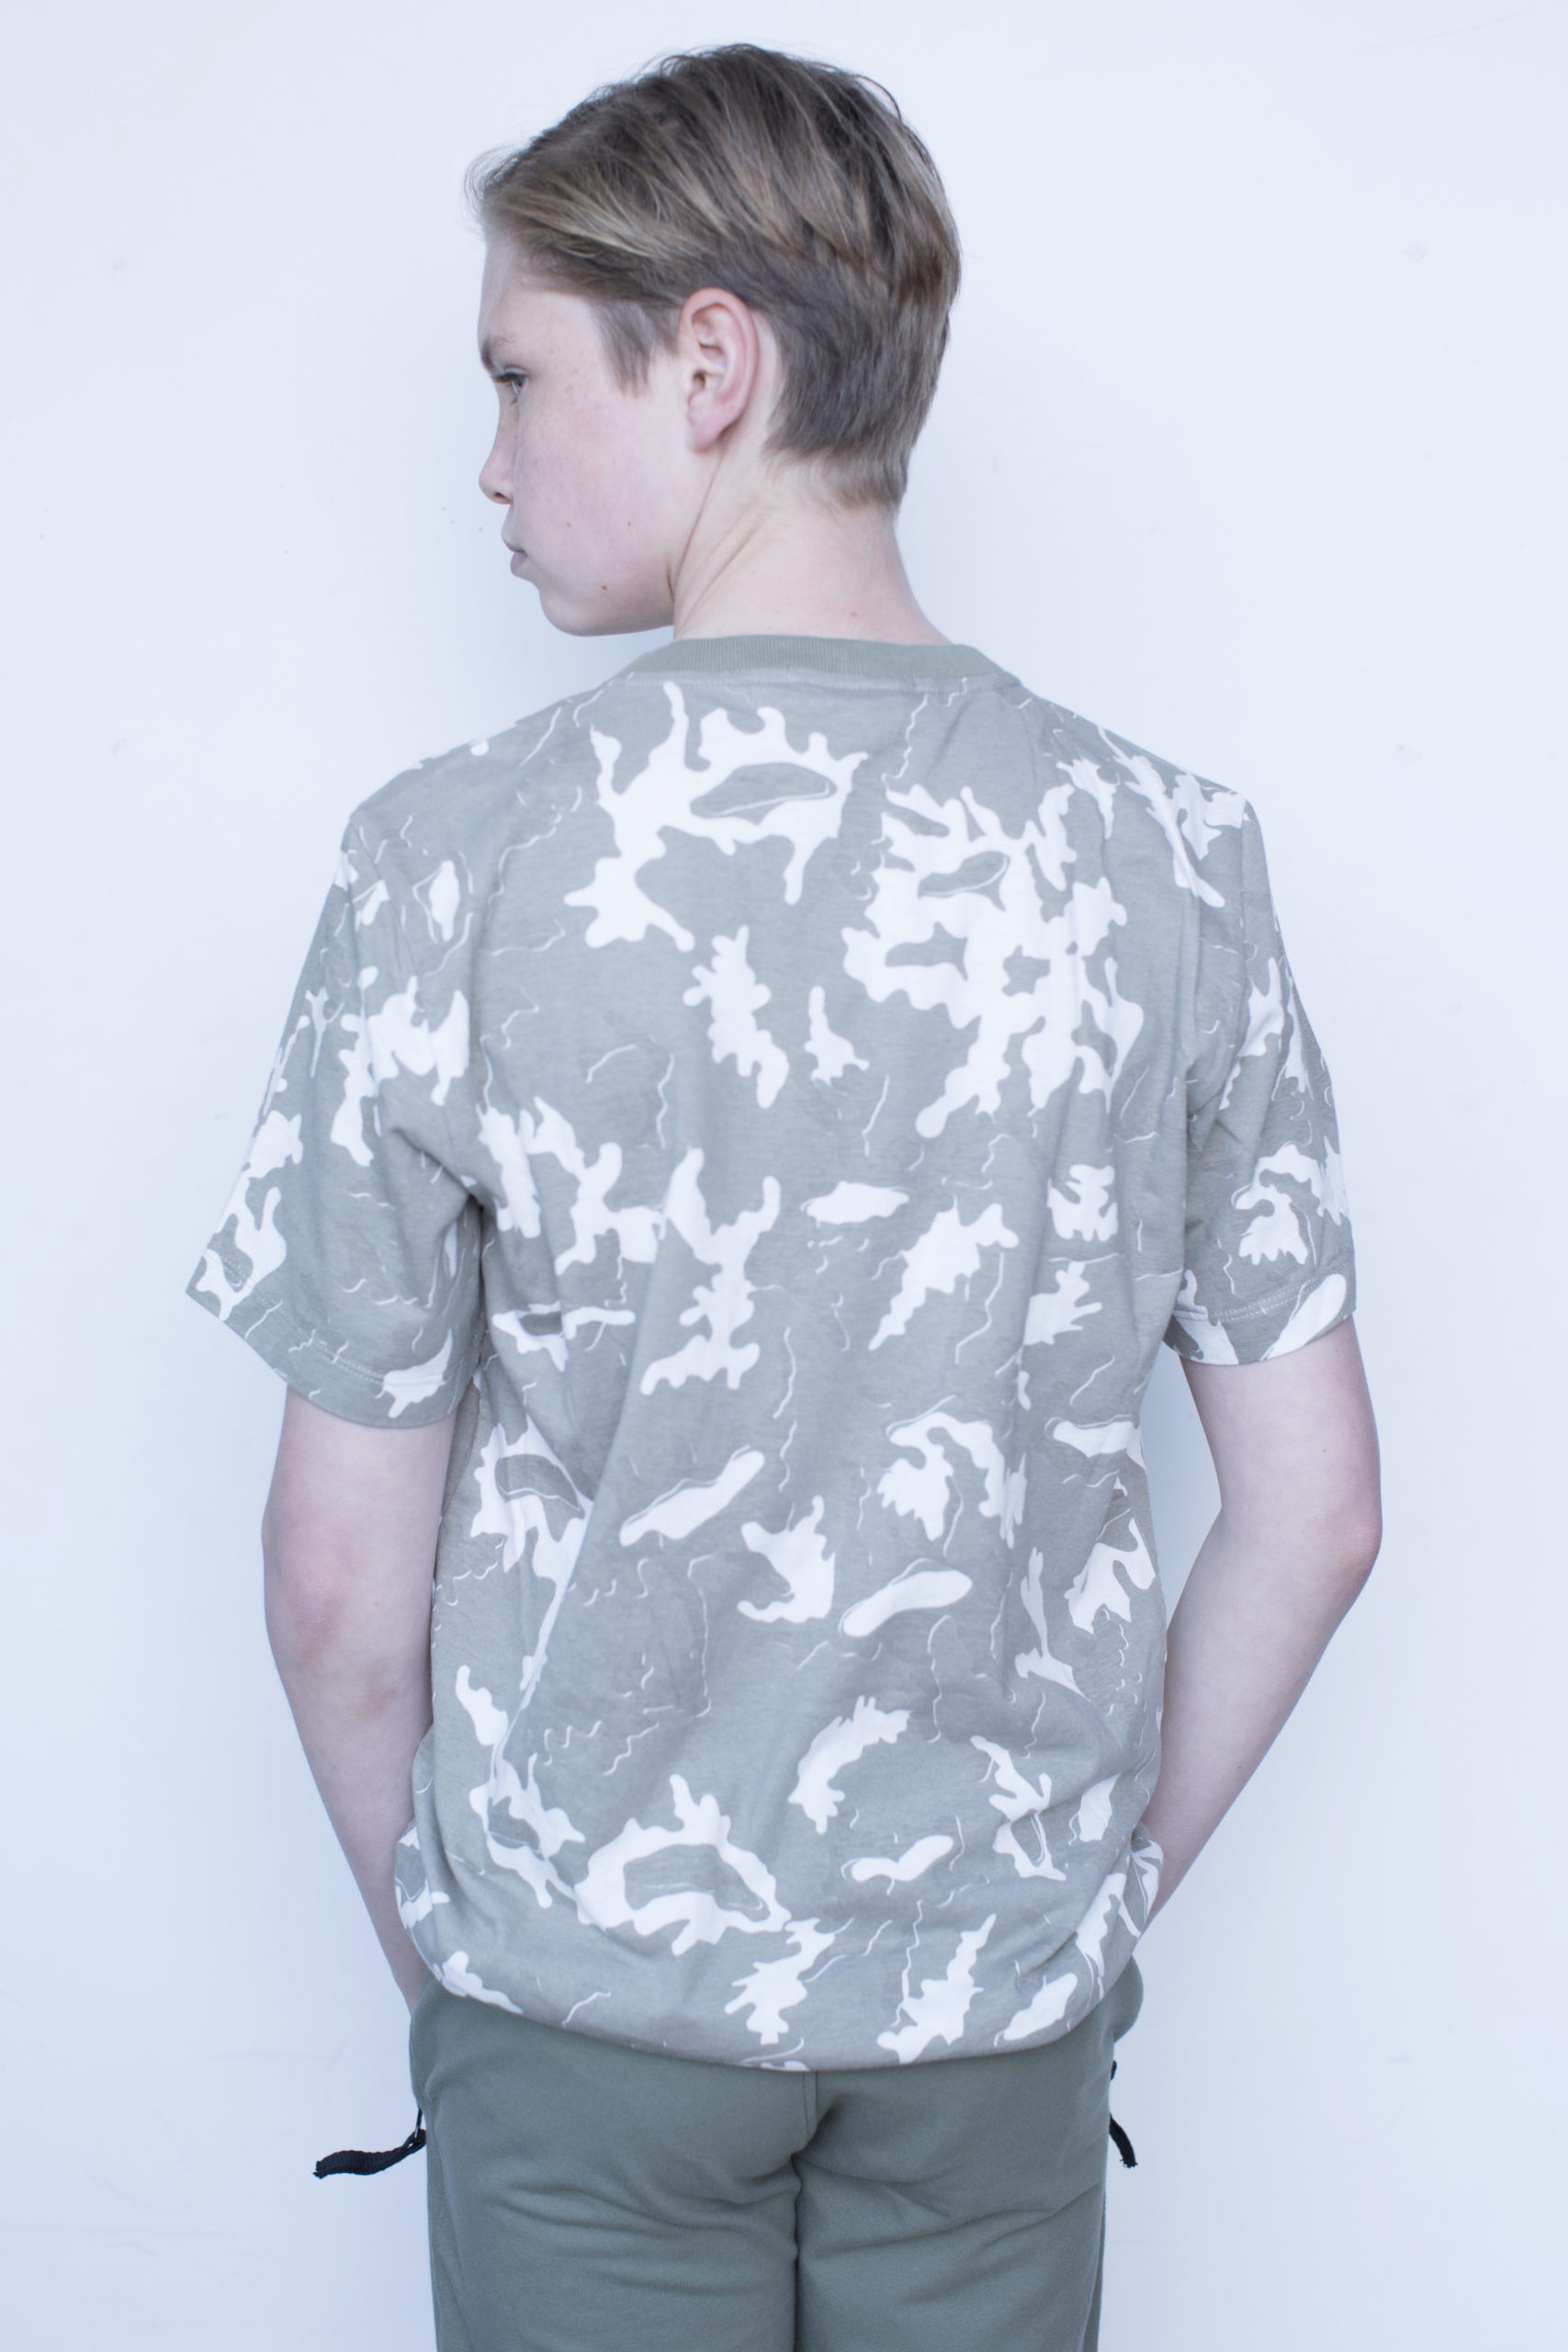 Stone Island army T-shirt